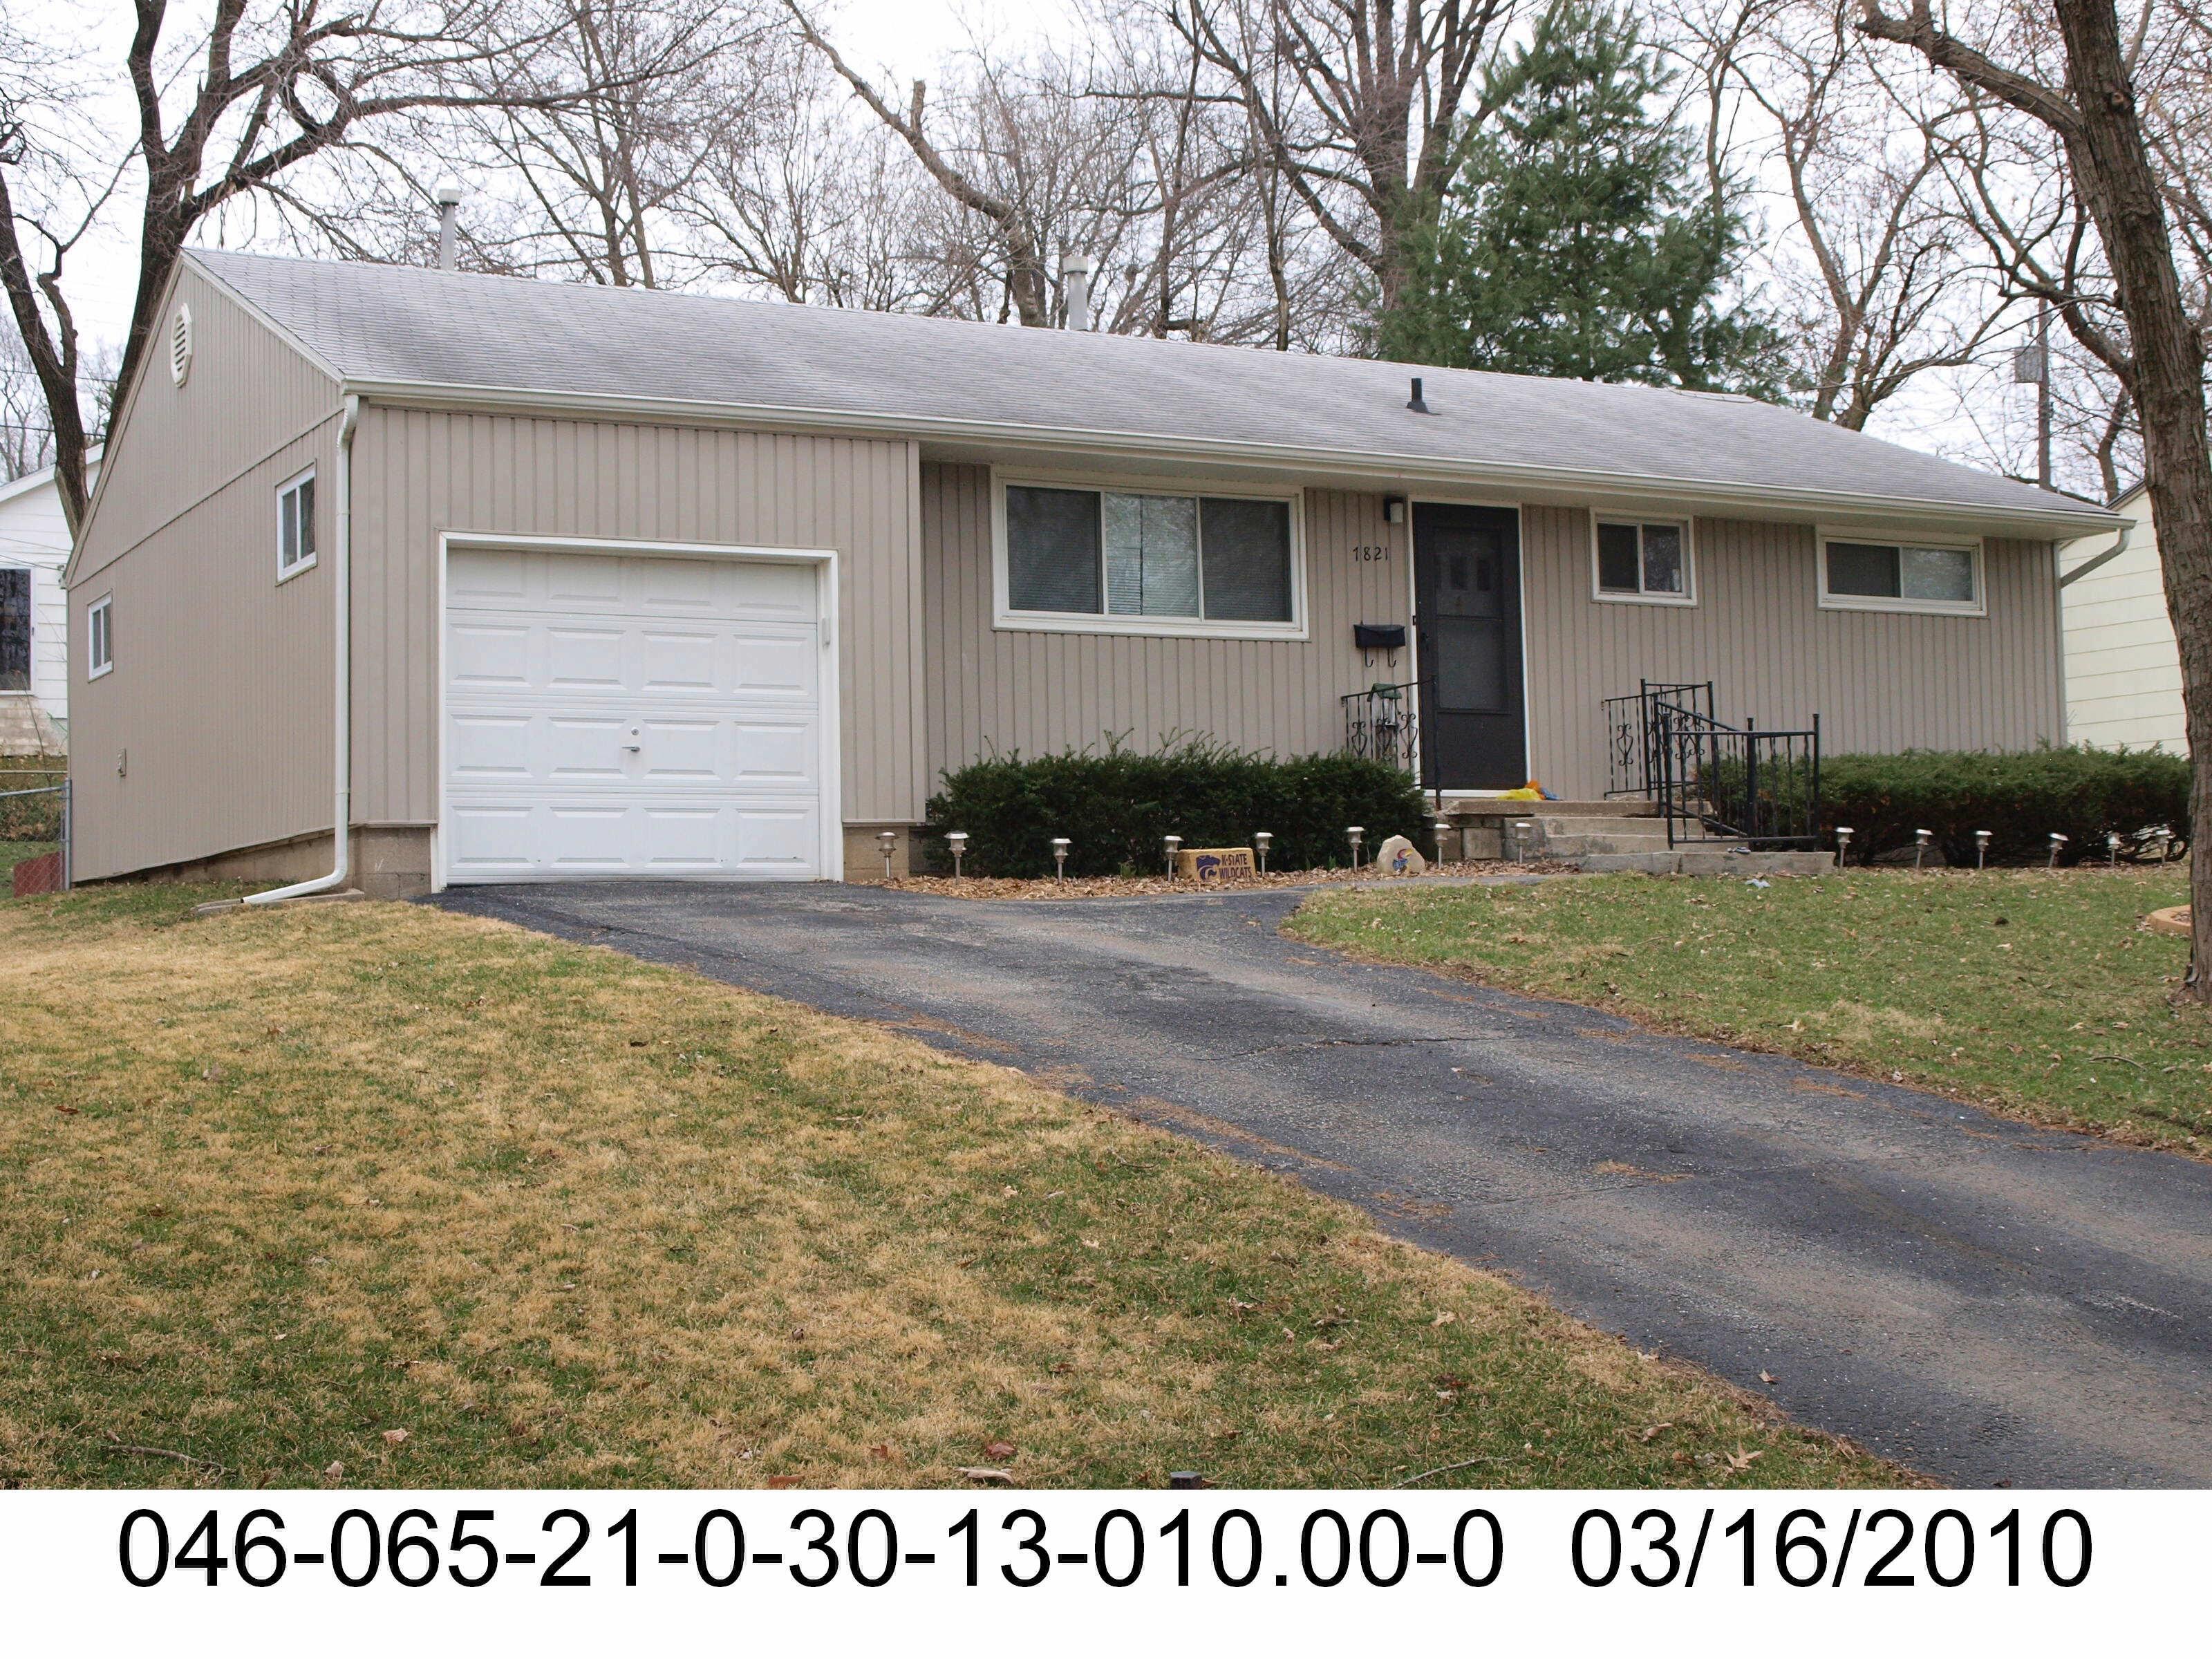 Kansas johnson county prairie village -  119 900 Property In Prairie Village Kansas